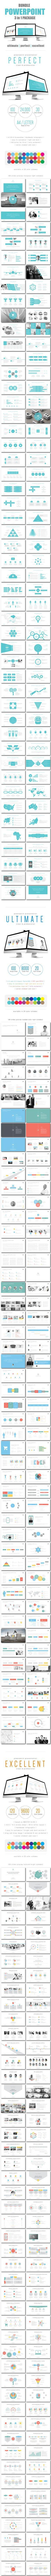 PowerPoint Bundle Templates #design Download: http://graphicriver.net/item/powerpoint-bundle/11508645?ref=ksioks